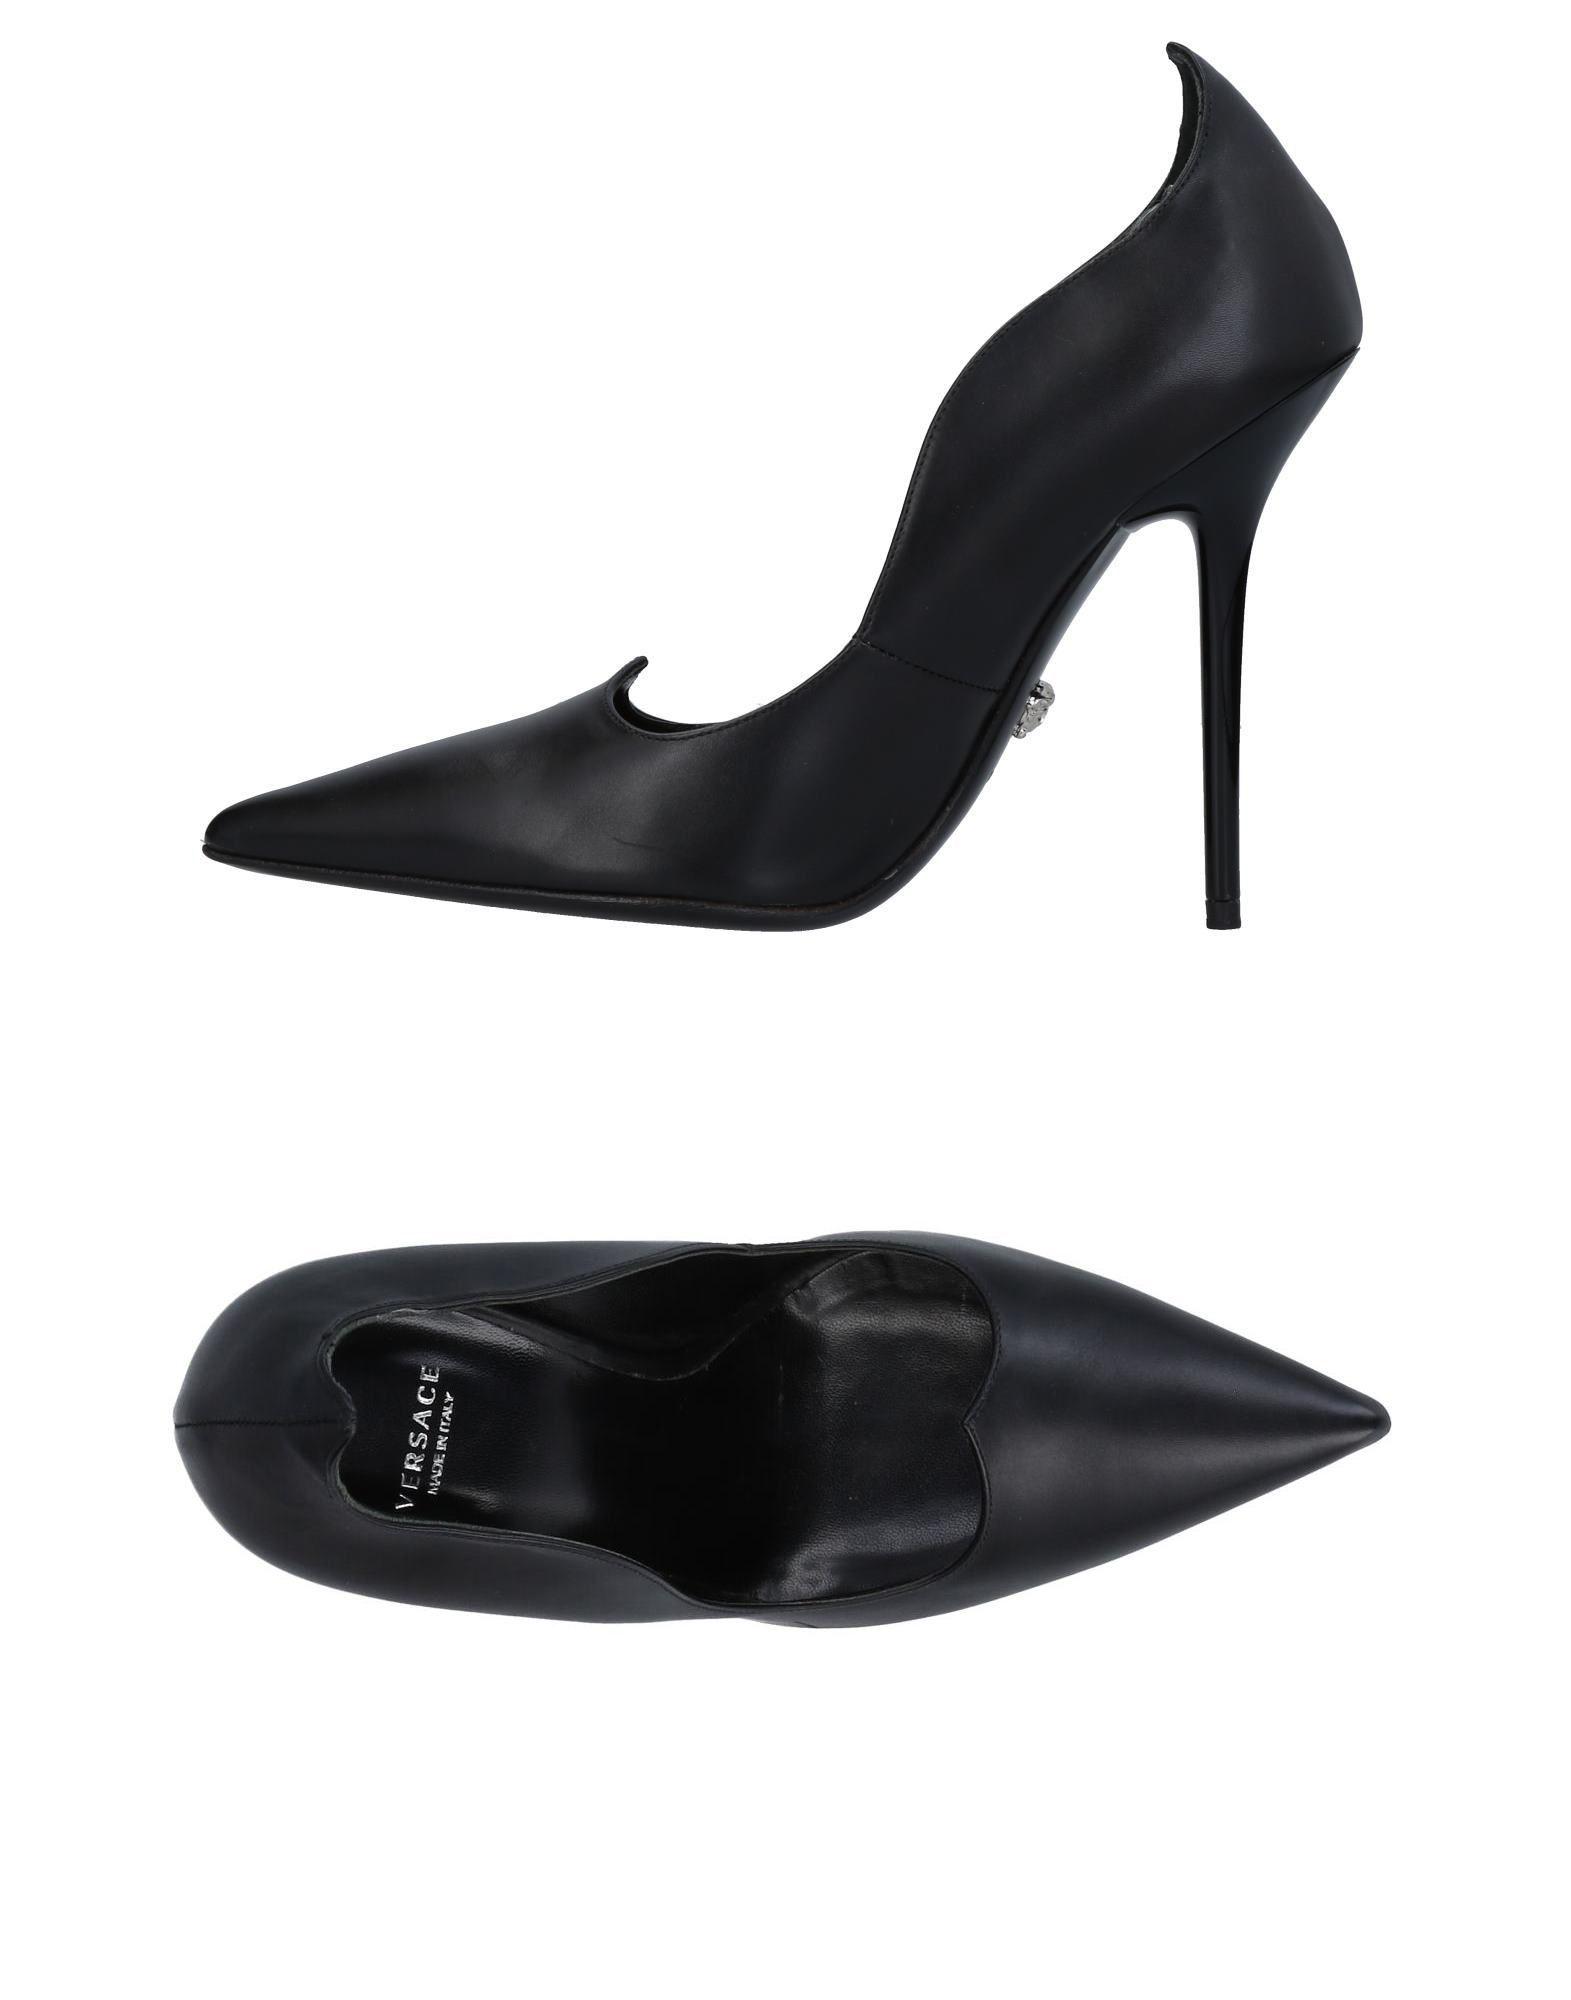 Décolleté Versace Donna - 11451893GO Scarpe economiche e buone